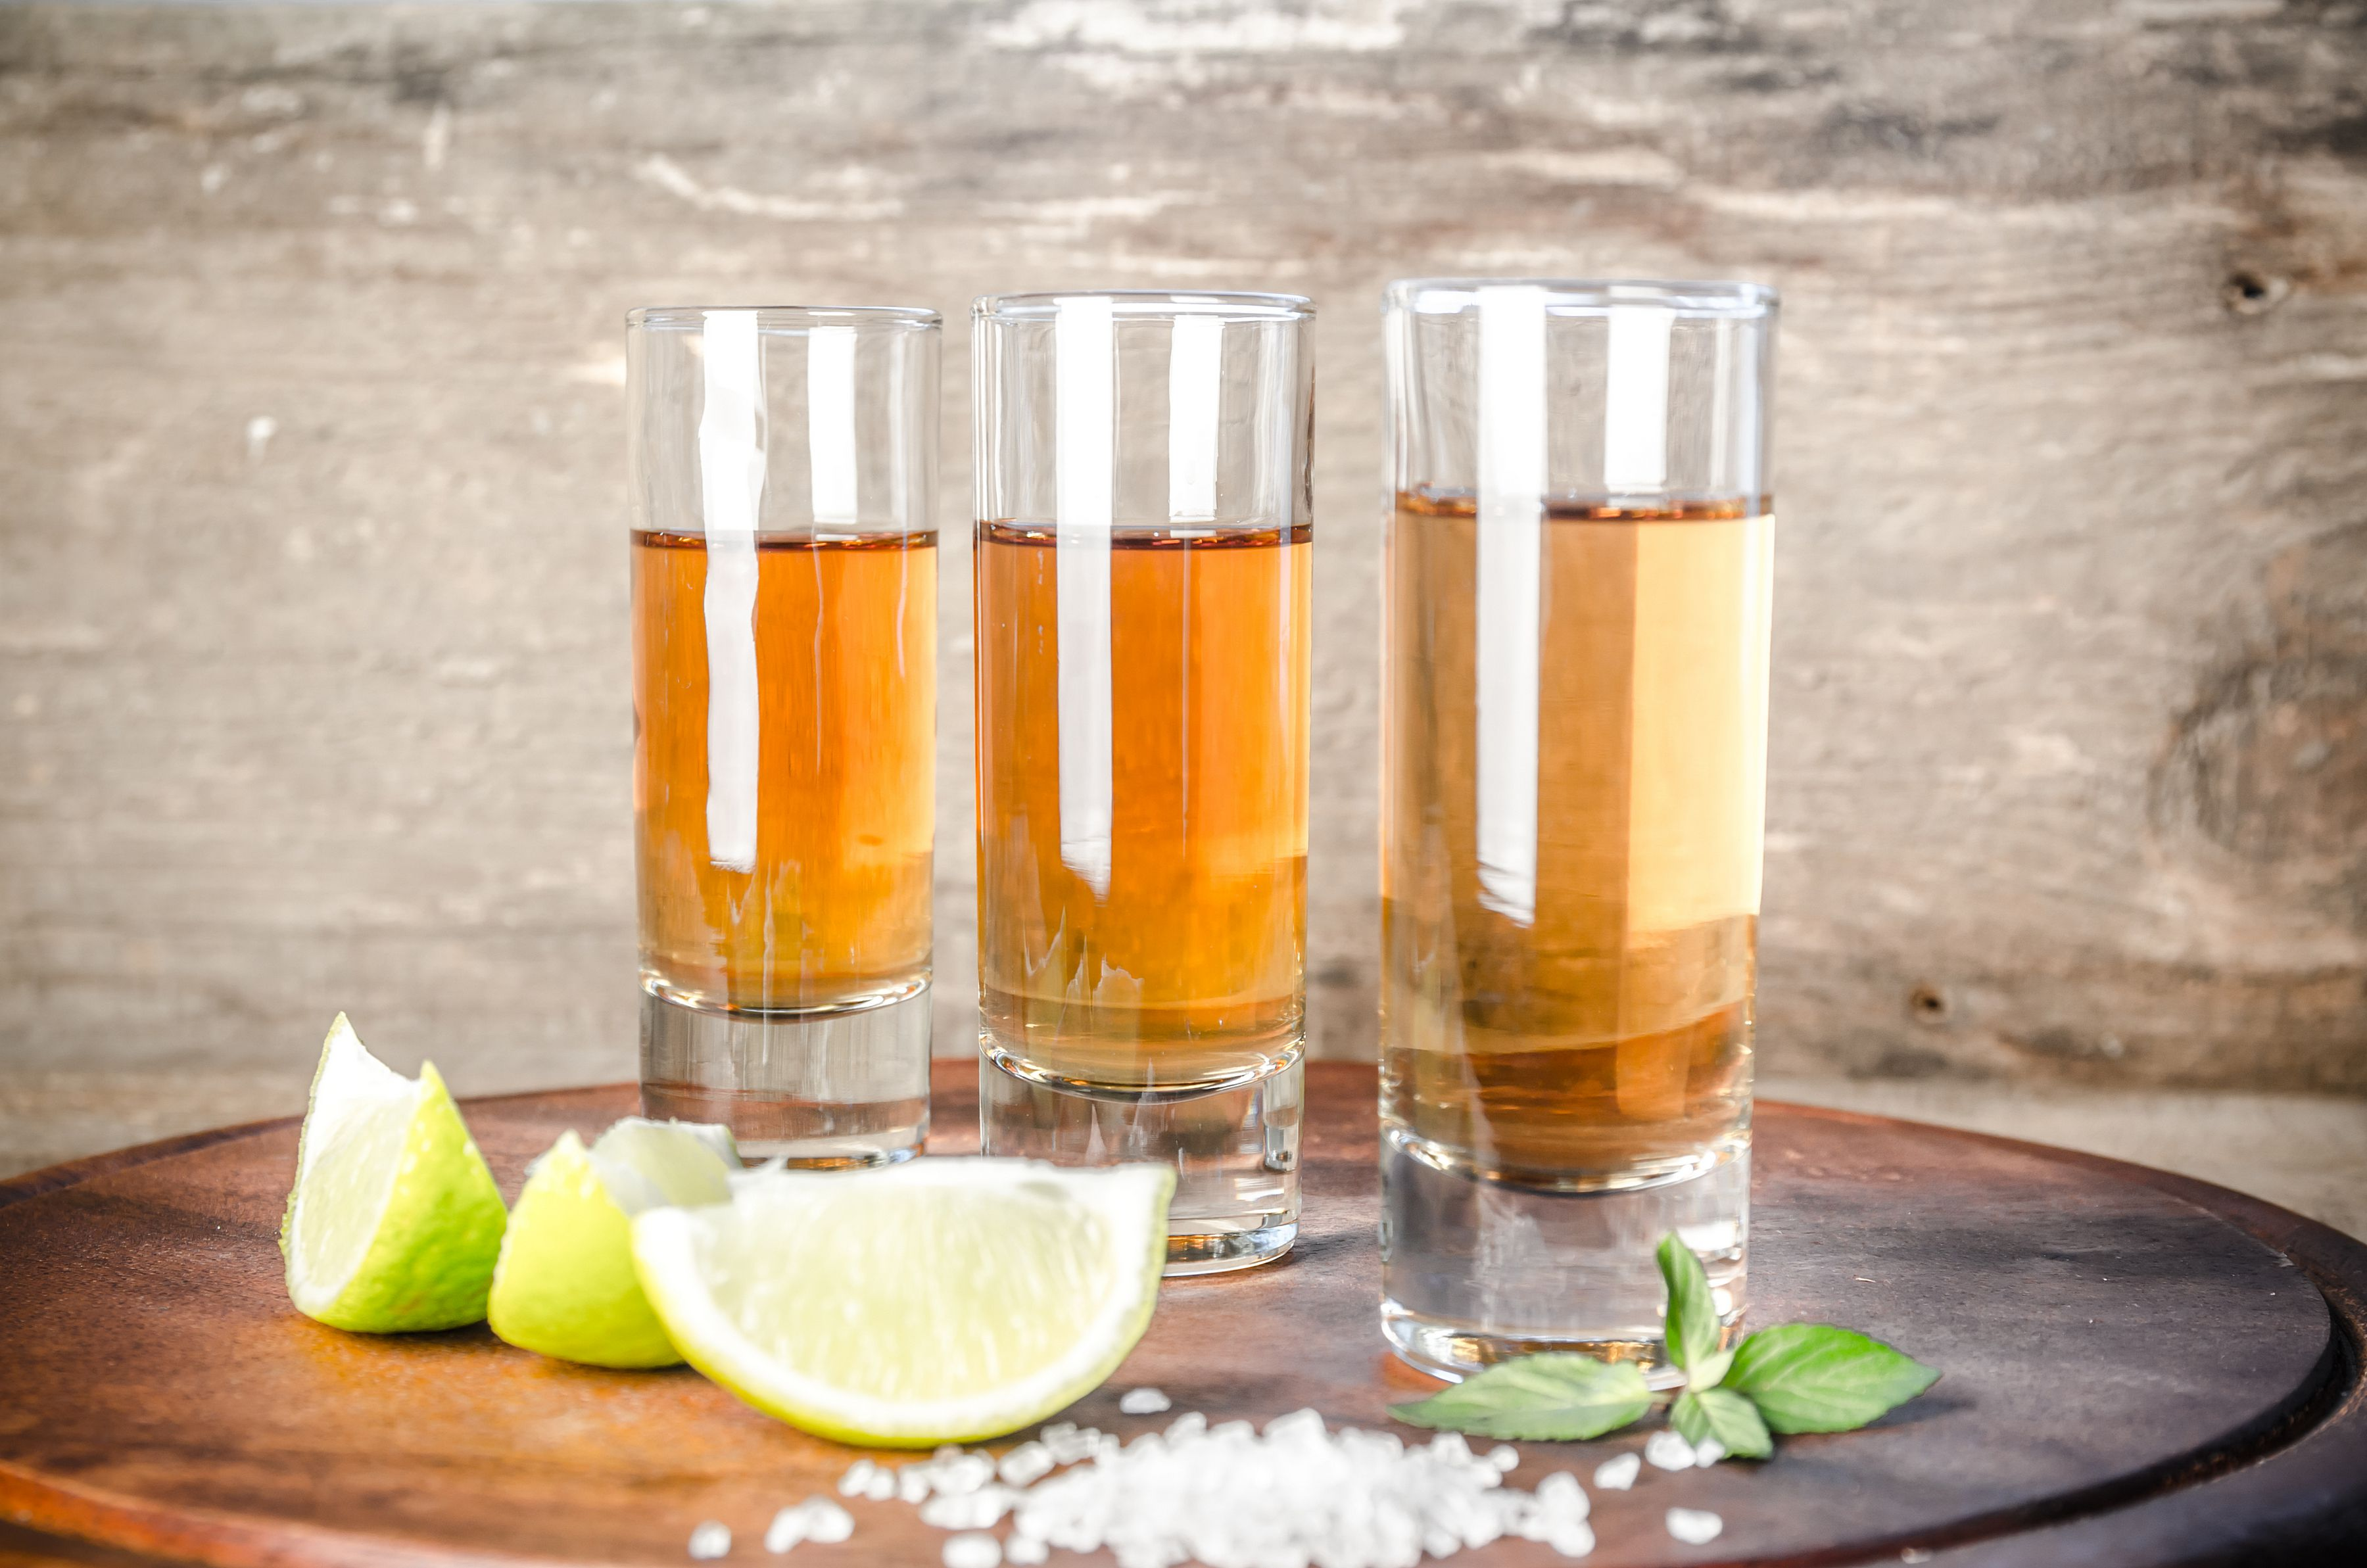 The 10 Best Añejo Tequilas to Drink in 2020